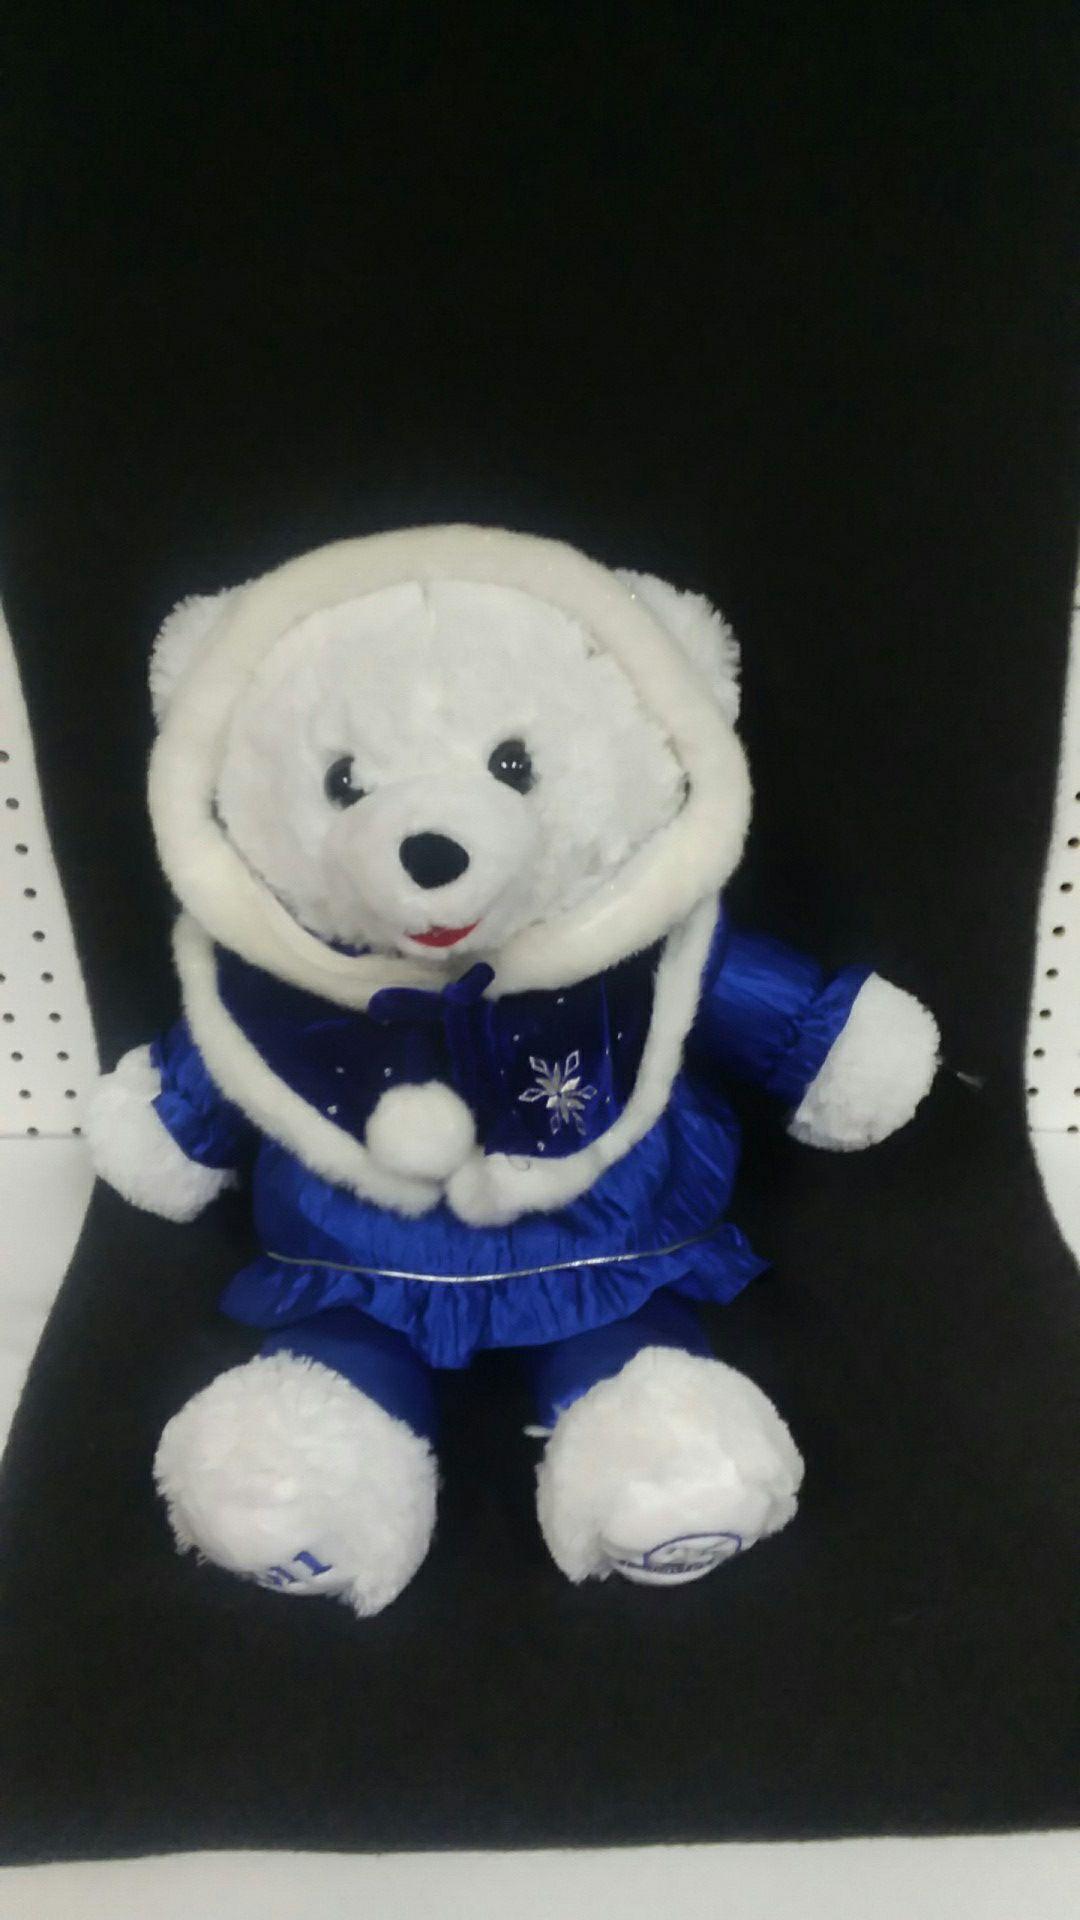 2011 25th Anniversary Christmas Teddy Bear